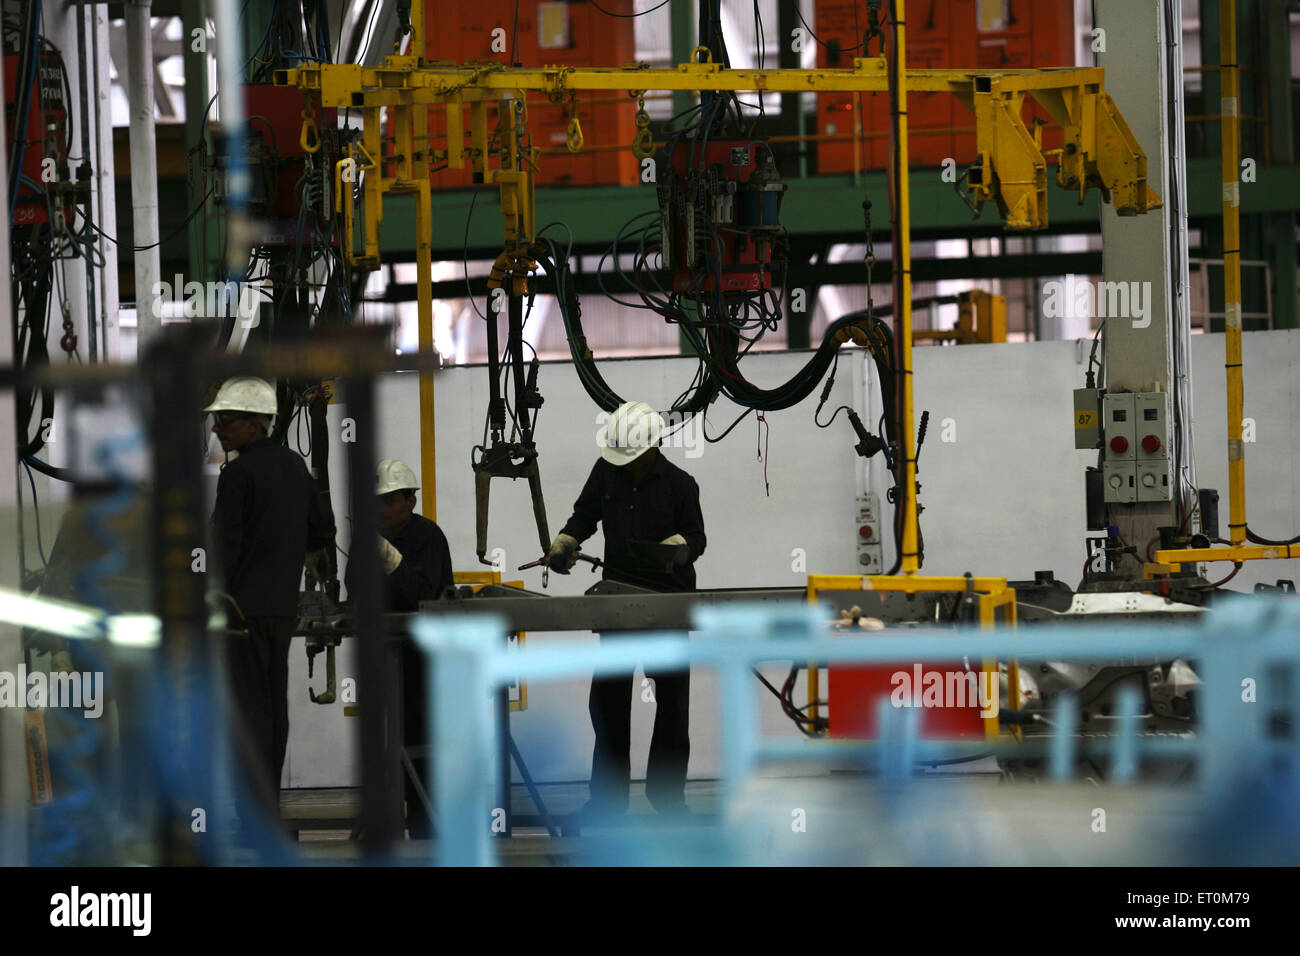 Automobile experts working on body of vehicles in workshop ; Tata motors plant ; Pimpri near Pune ; Maharashtra - Stock Image